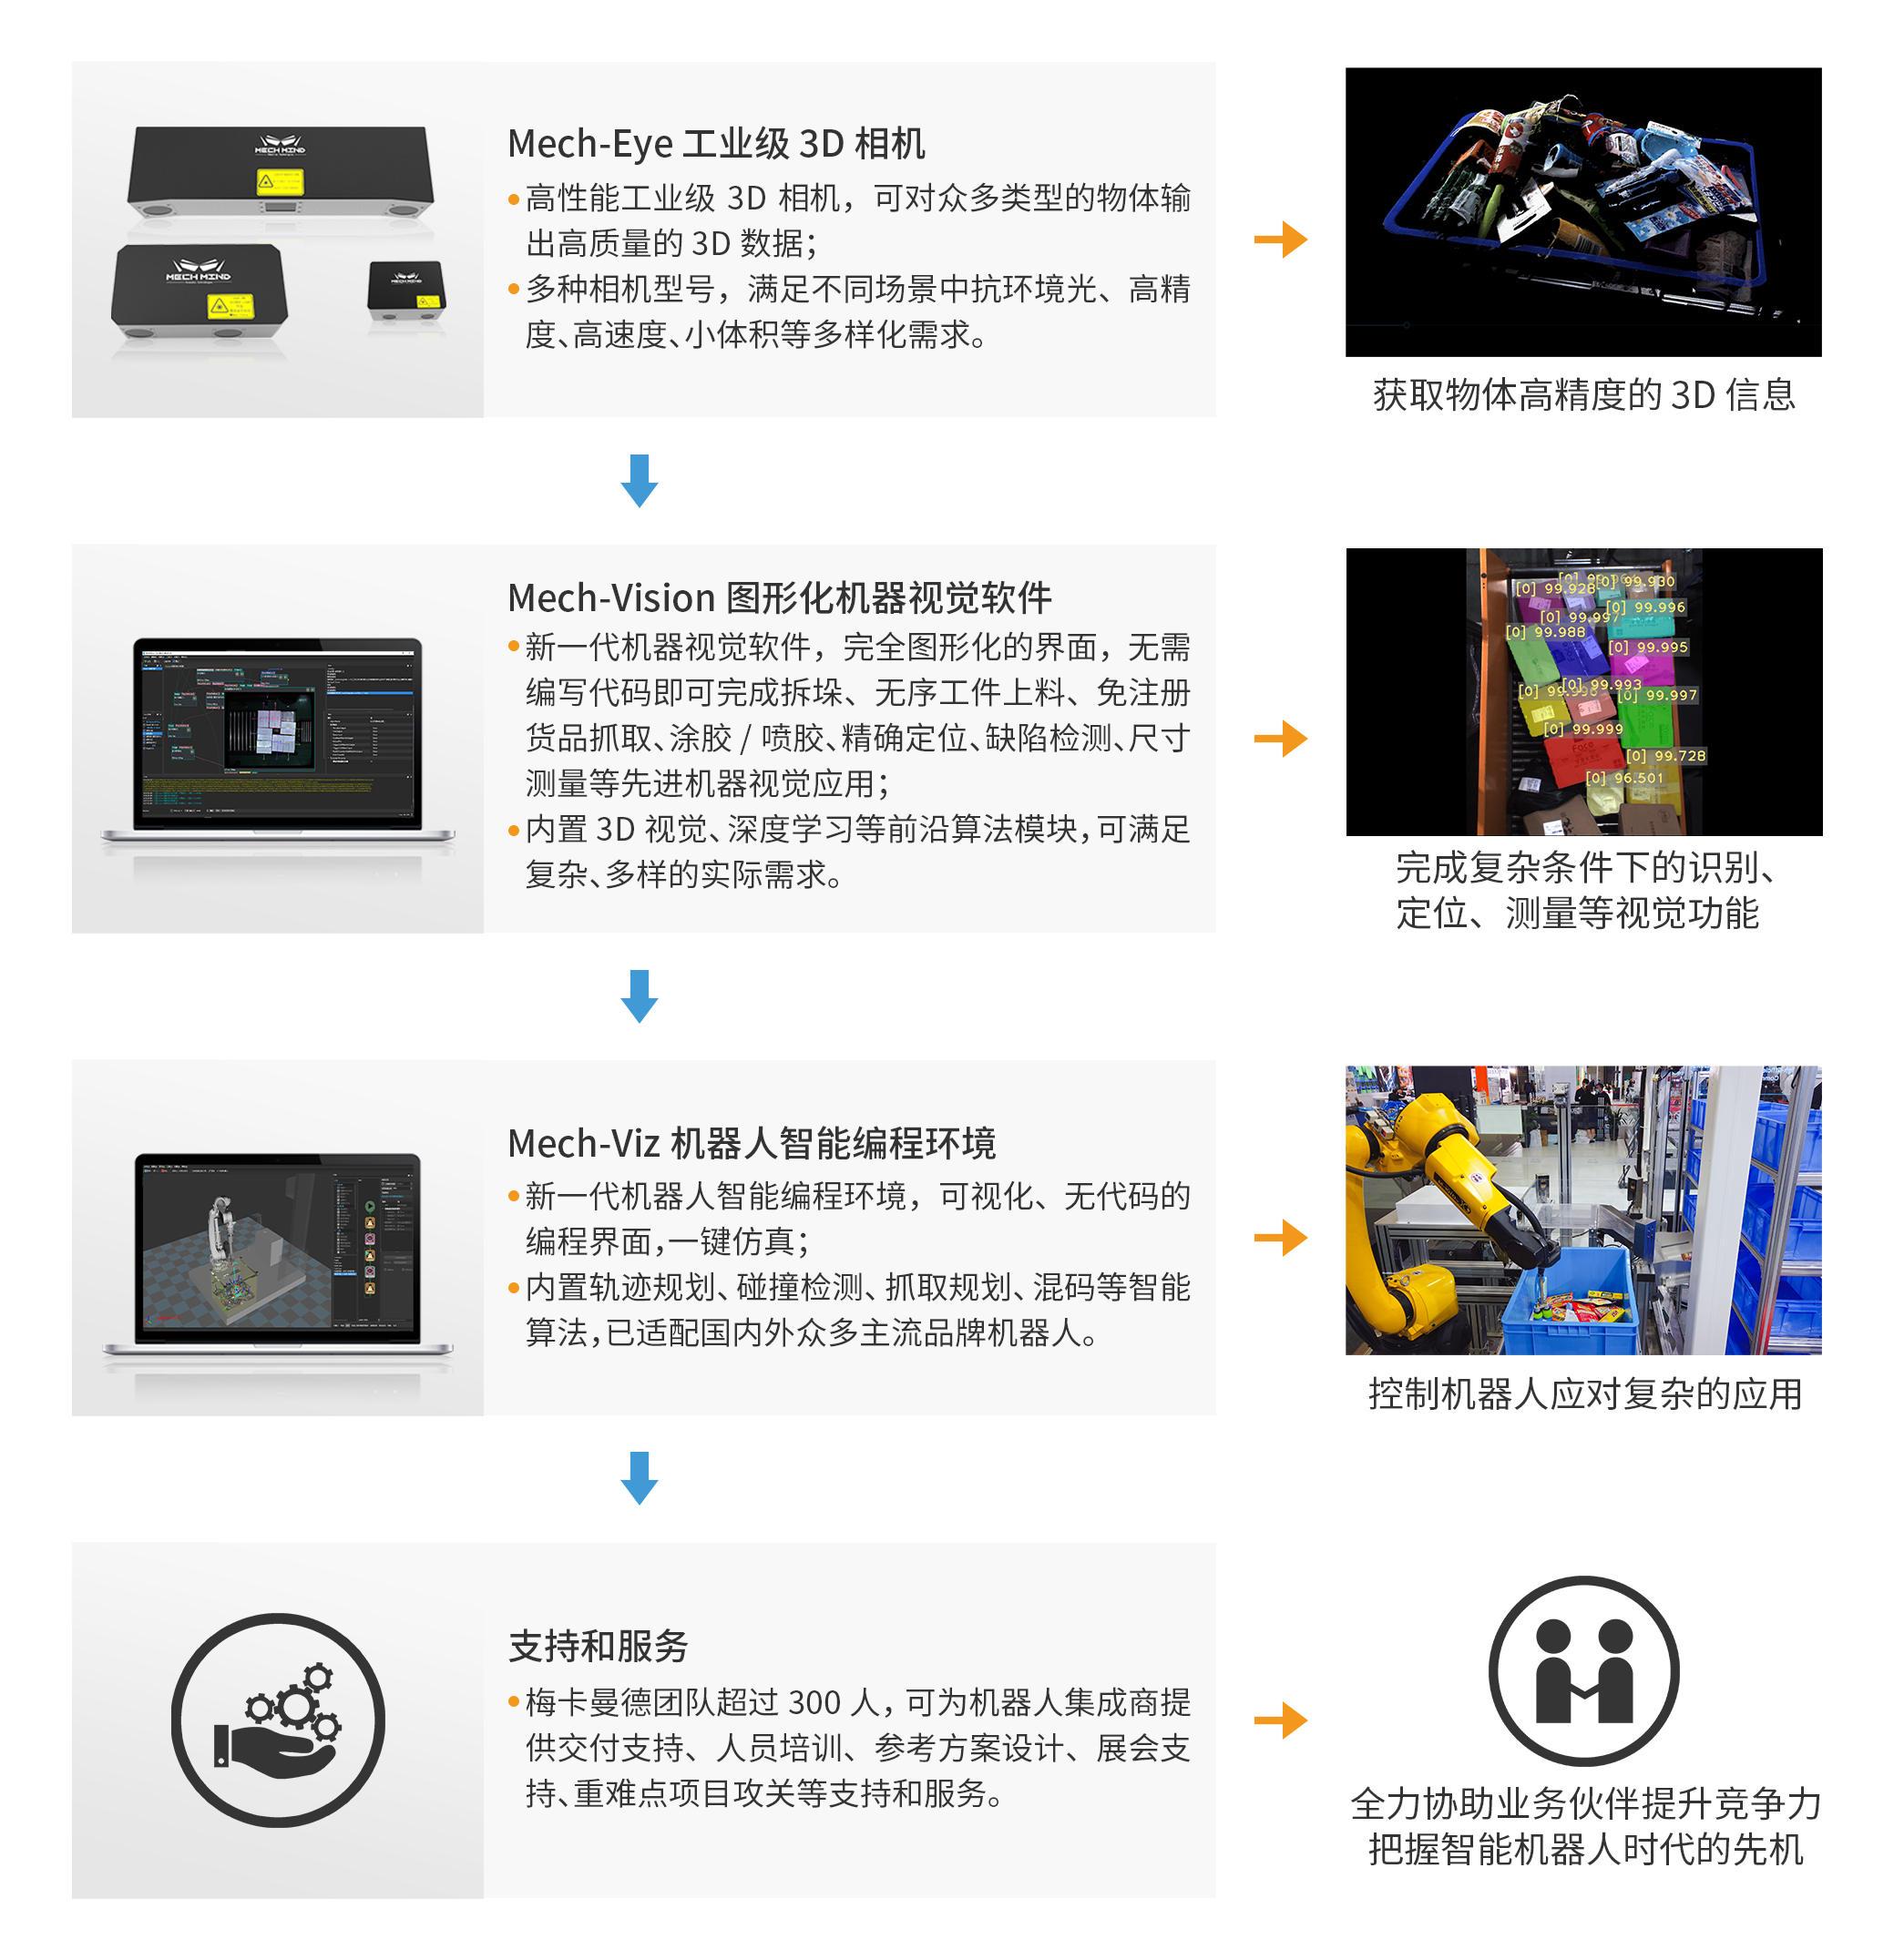 """3D视觉+AI+机器人""解决方案提供商「梅卡曼德机器人」完成数亿元C轮融资"